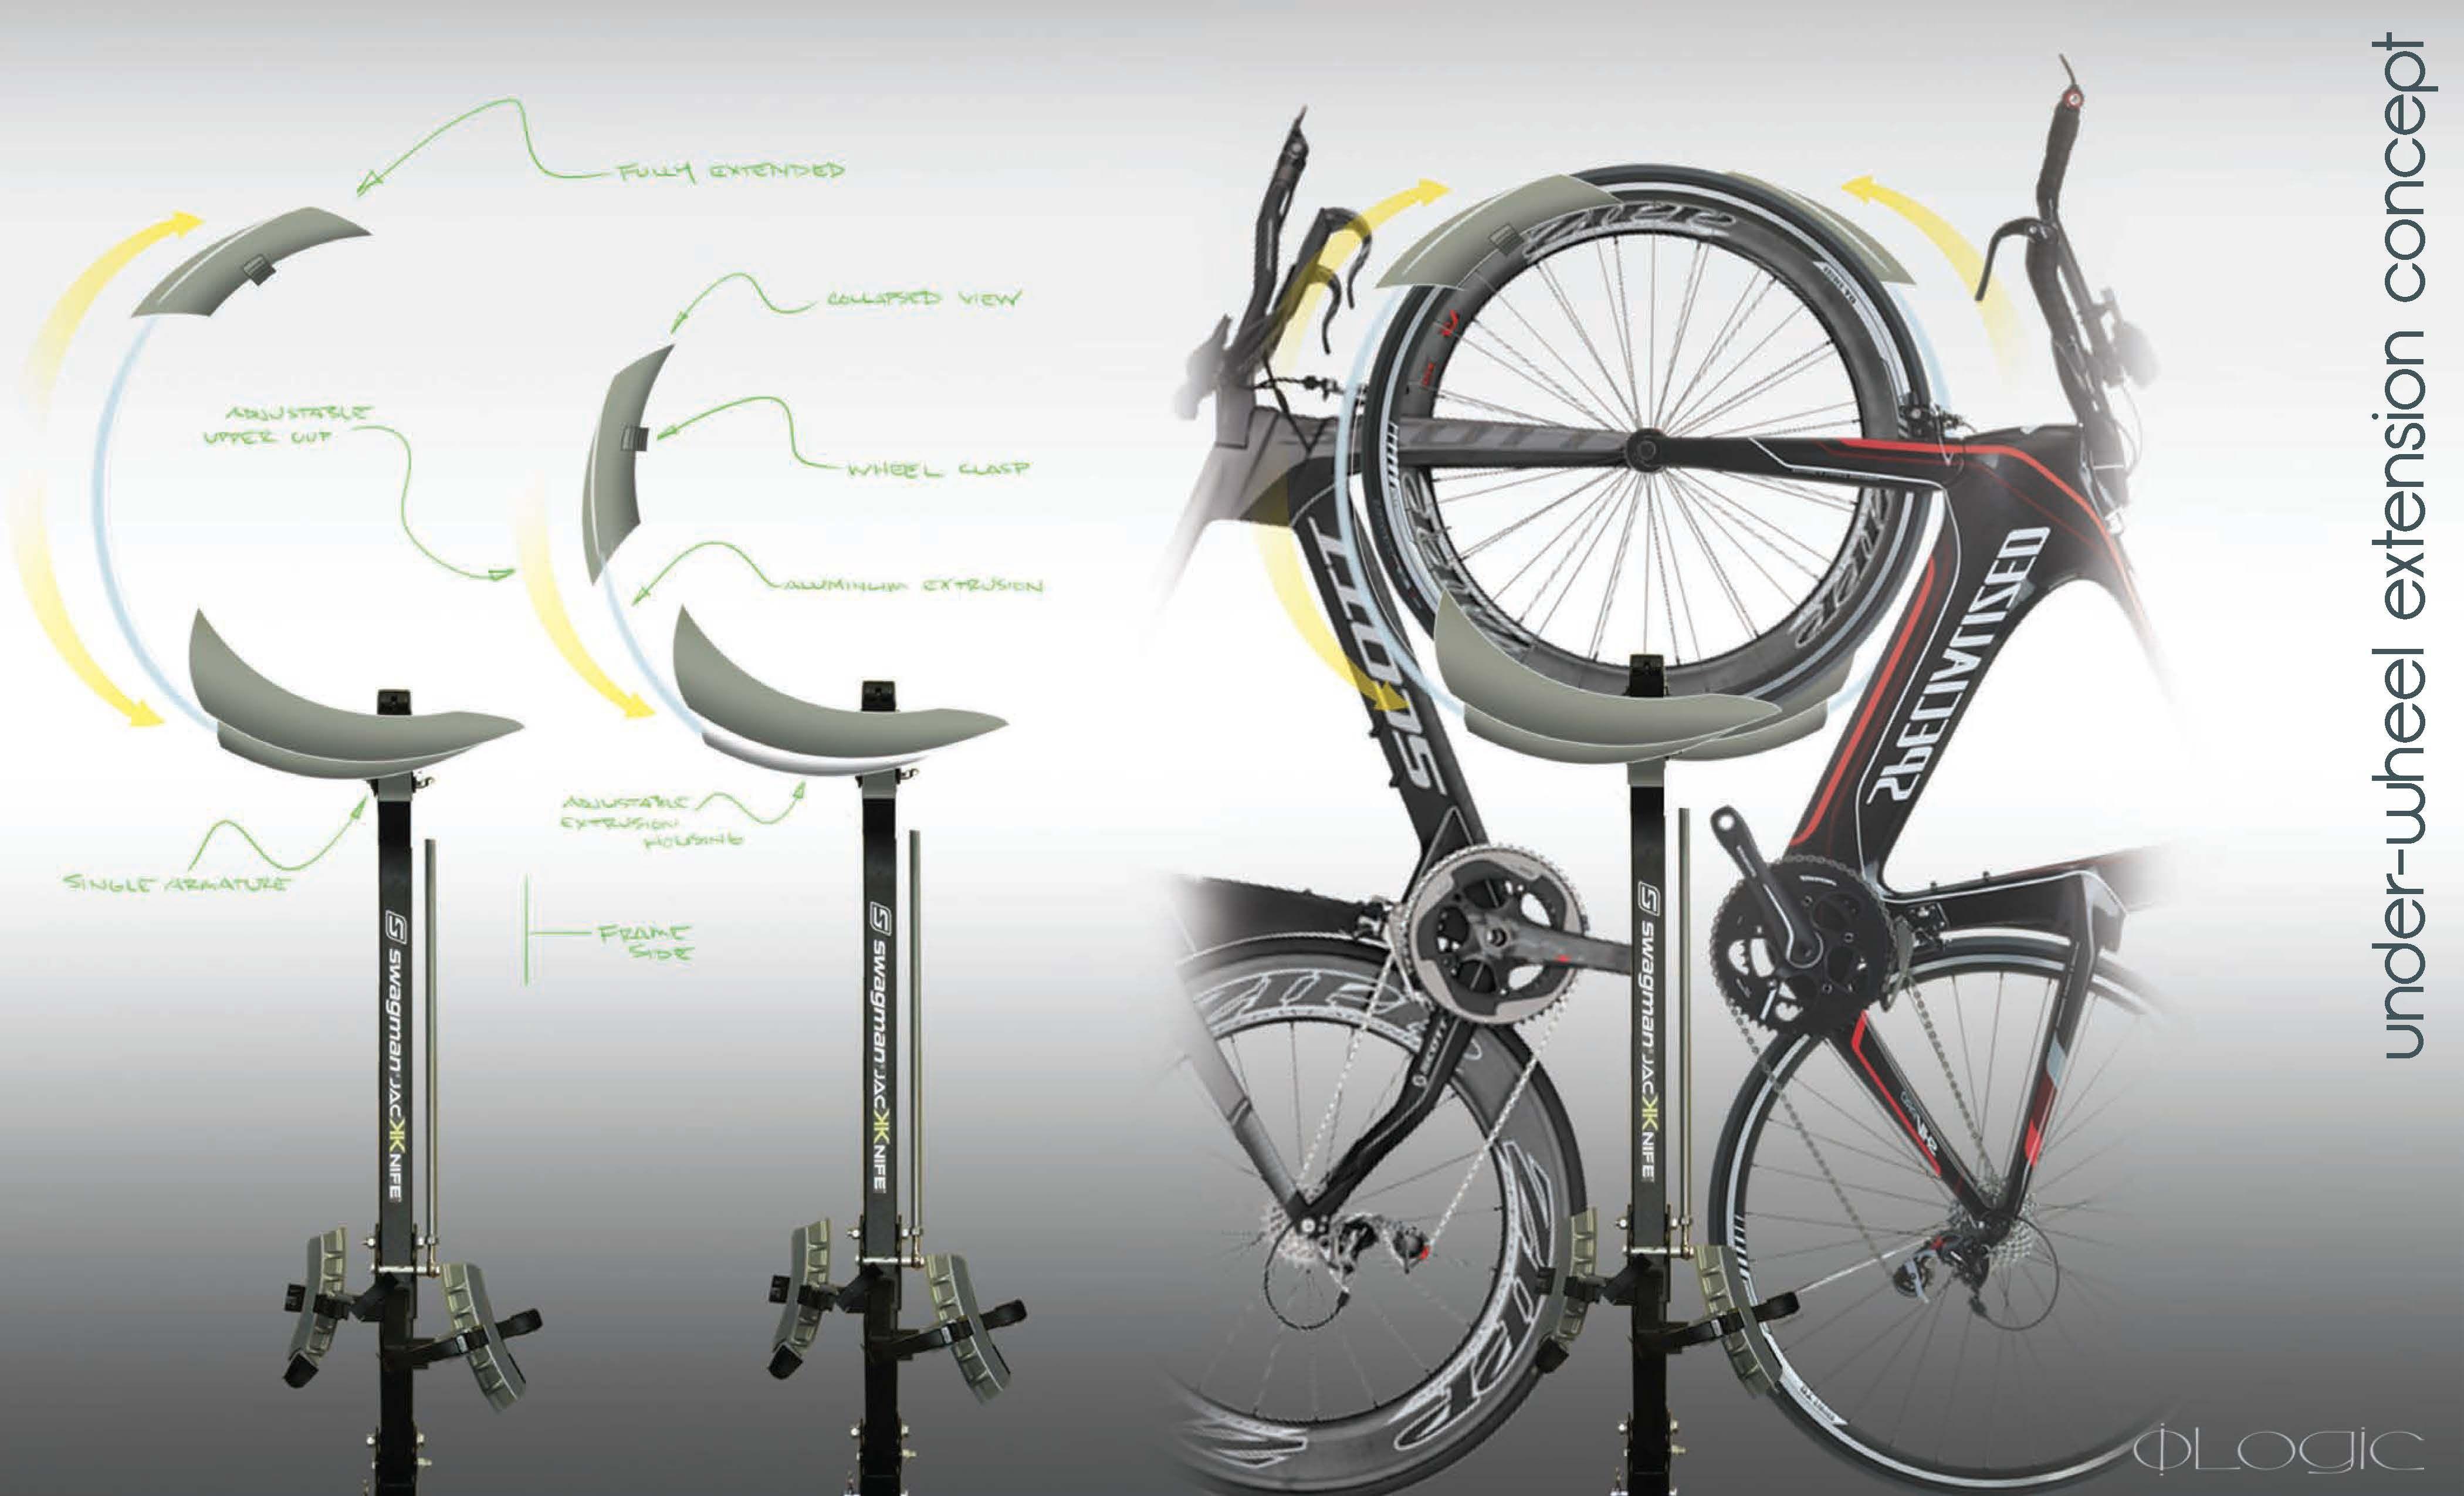 Product Design Vertical Mount Universal Bike Rack For Swagman